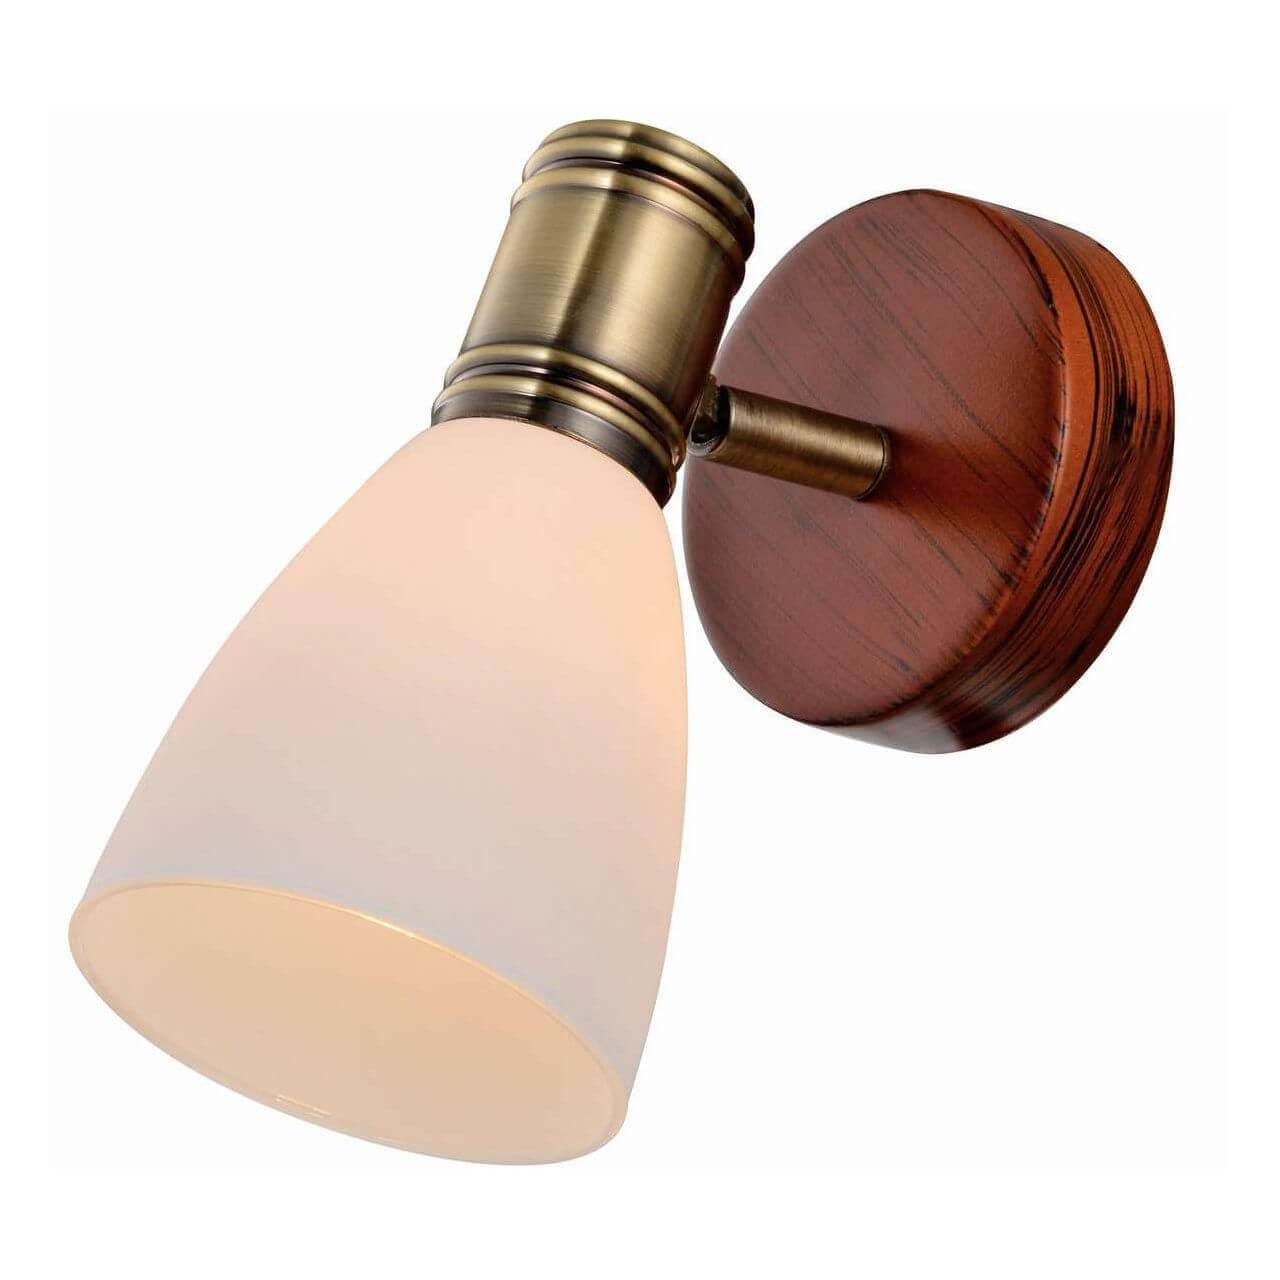 Фото - Спот Toplight TL3720Y-01BB Sharyl светильник без эпра toplight sharyl tl3720y 03bb 48 х 16 см e14